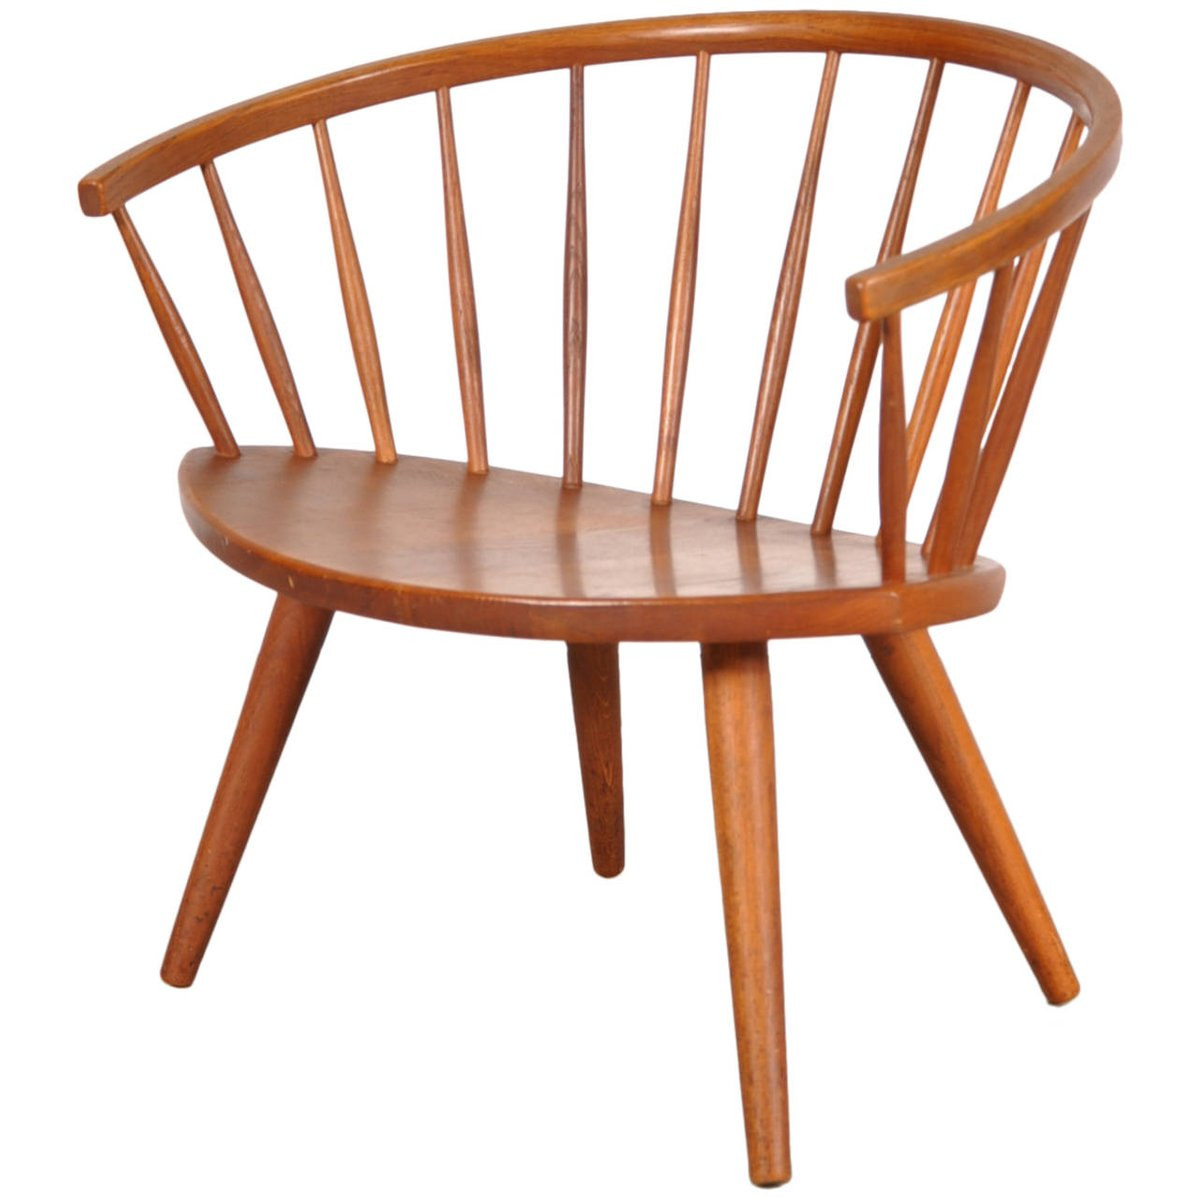 Model Arka Oak Easy Chair by Yngve Ekström for Stolab, 1950s for sale at Pamono